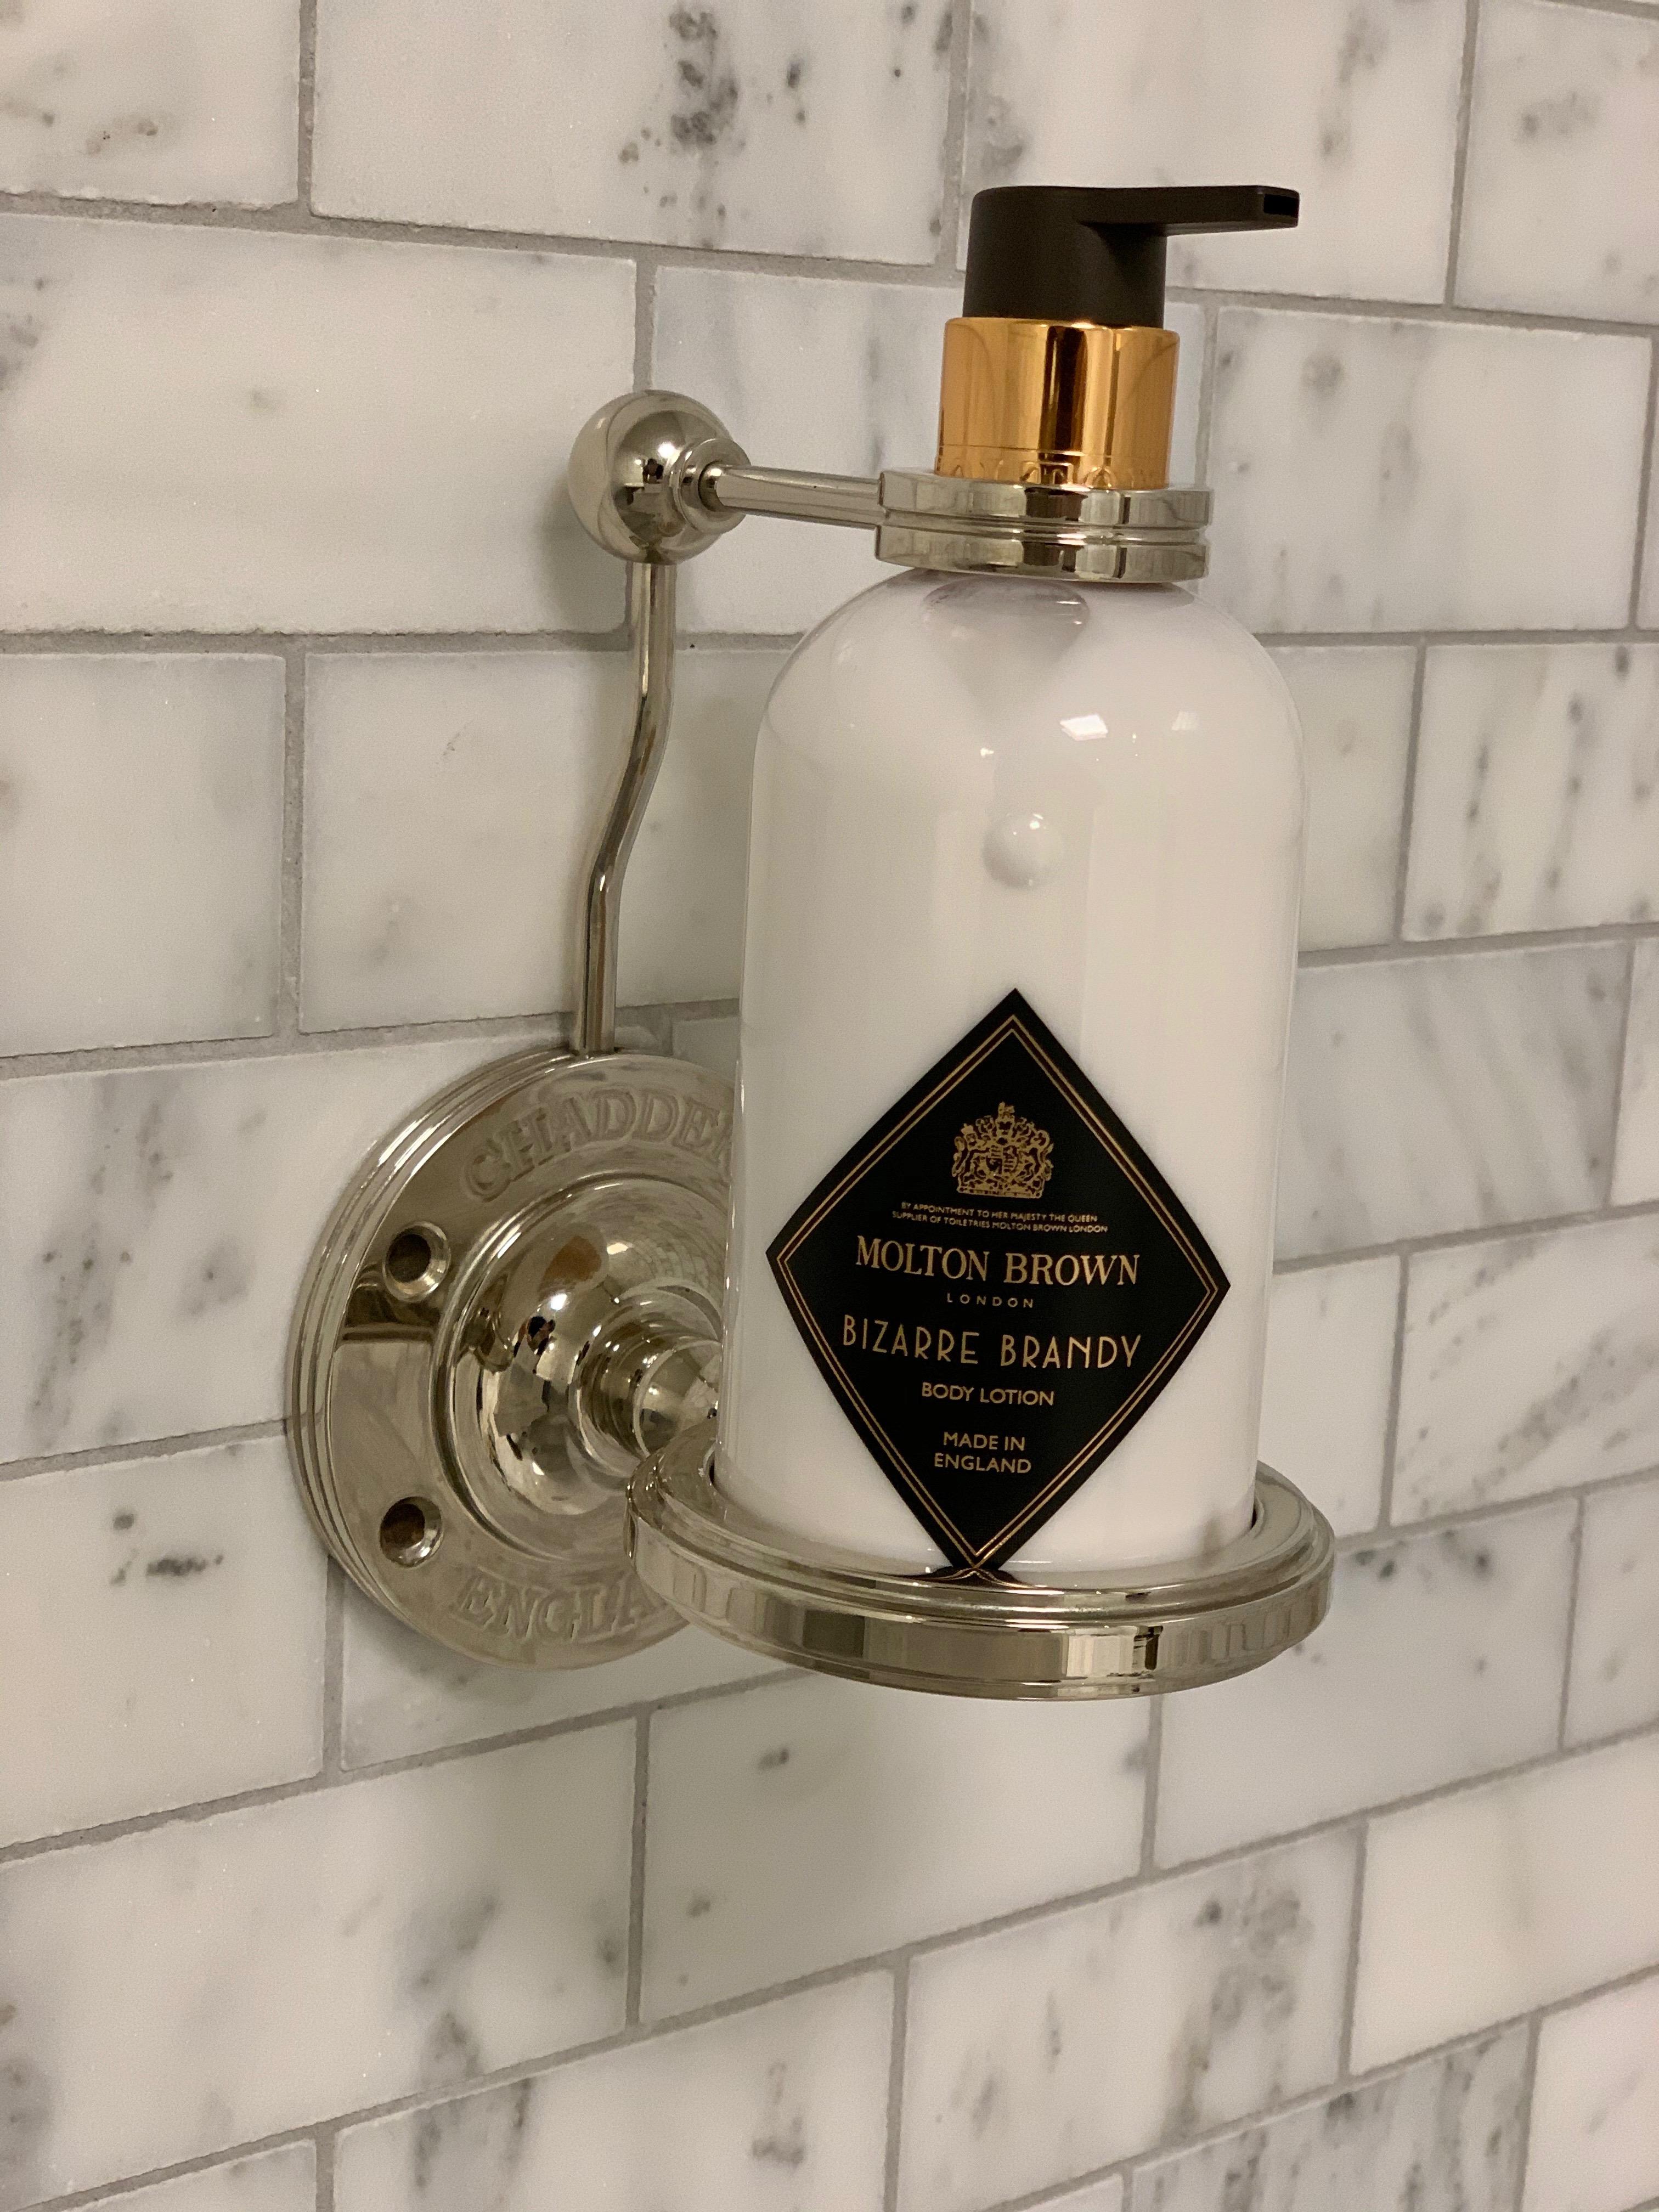 bathroom accessory soap bottle holder